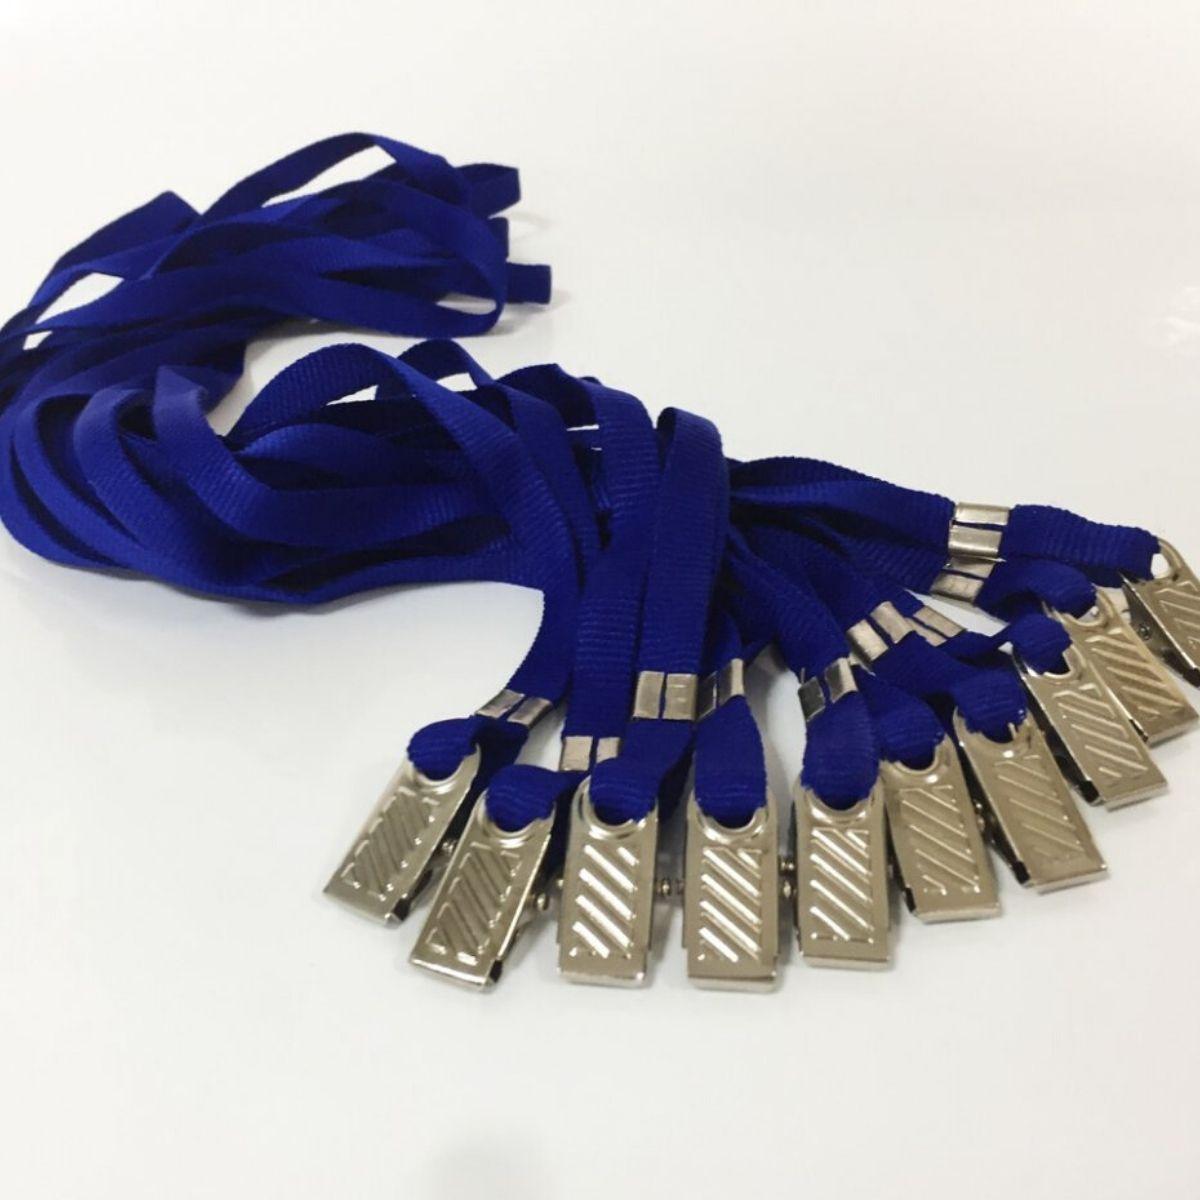 Kit Porta Crachá Rígido Conjugado Cristal + Cordão Azul Royal - 100 unidades  - Click Suprimentos